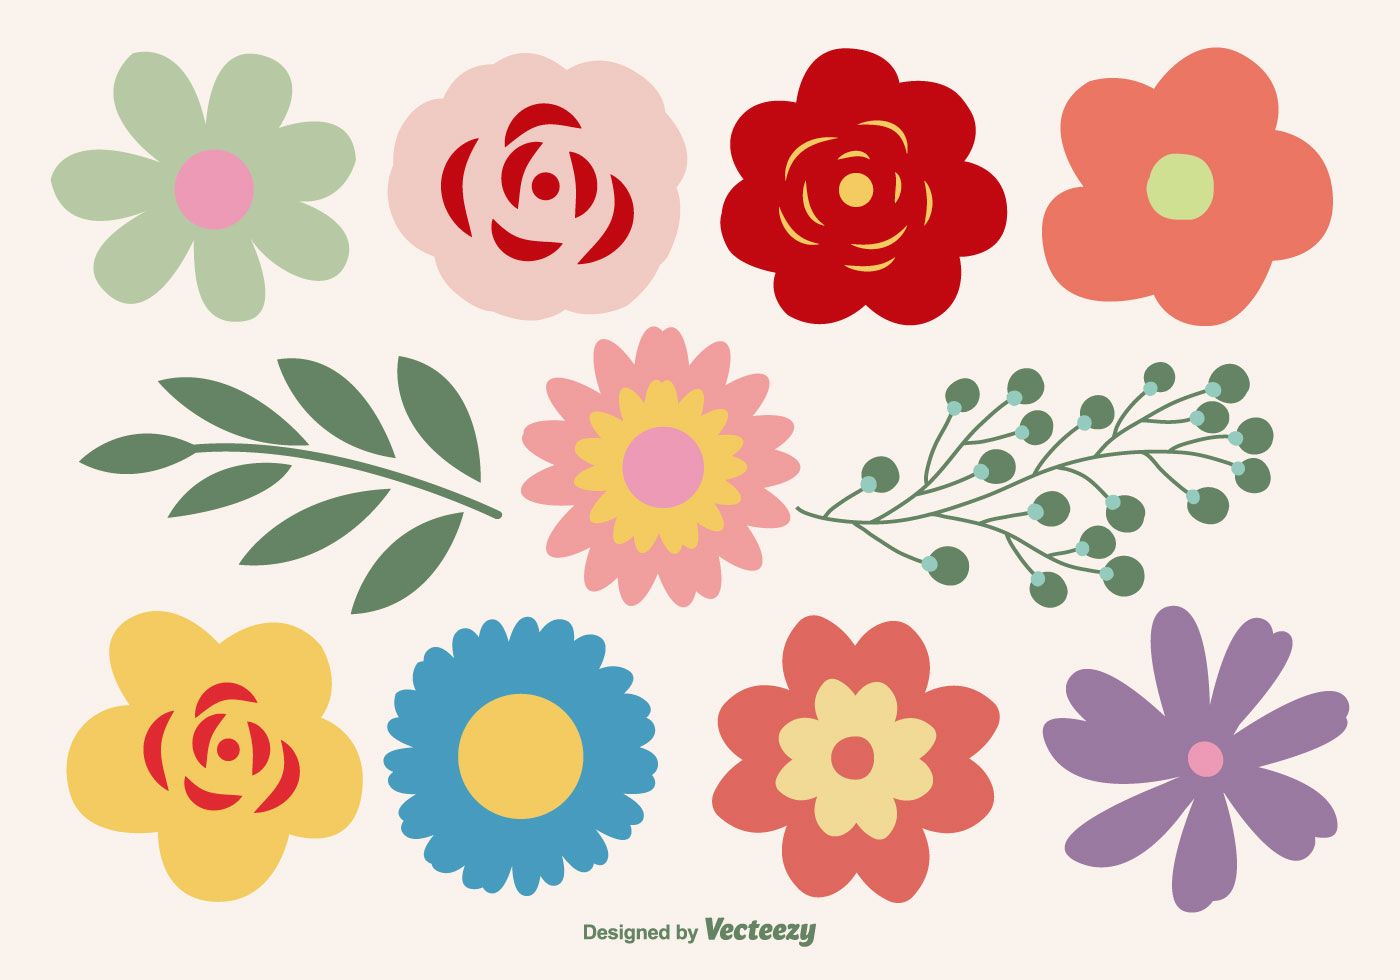 Flower vector graphics clipart. Flowers free art downloads